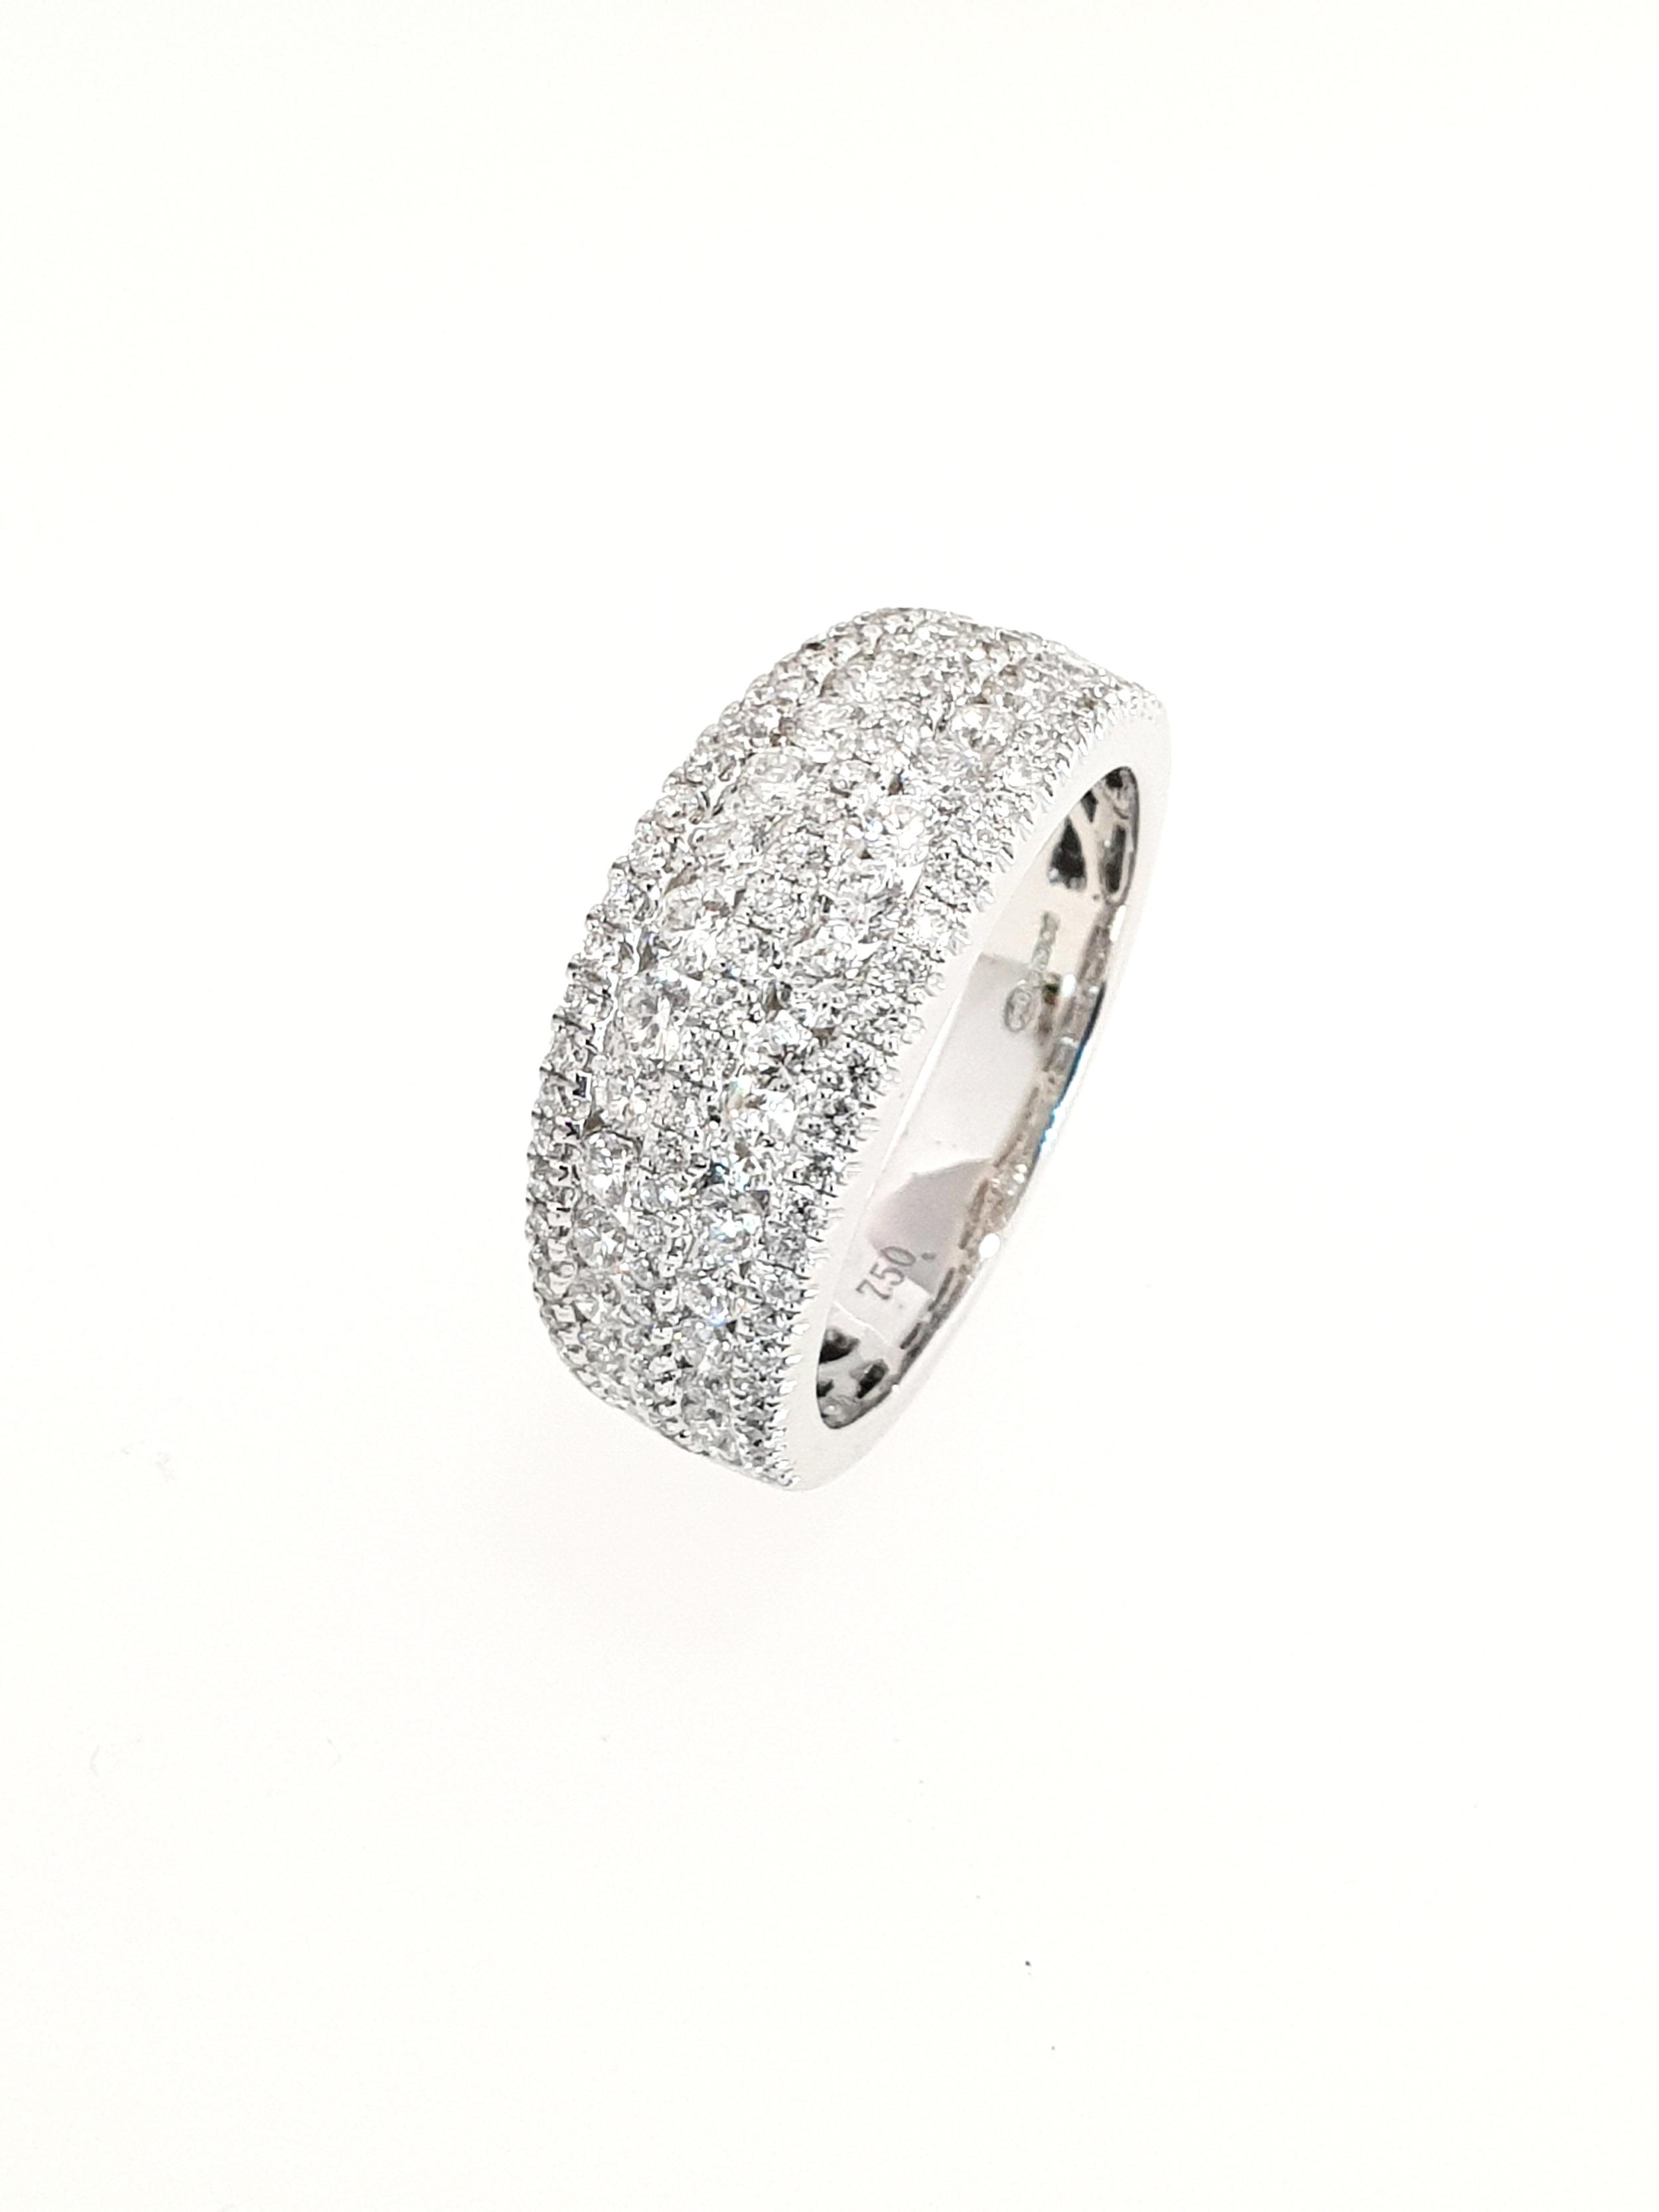 18ct White Gold 5 Row Diamond Ring  1.27ct, G, SI1  Stock Code: N8905  £4300